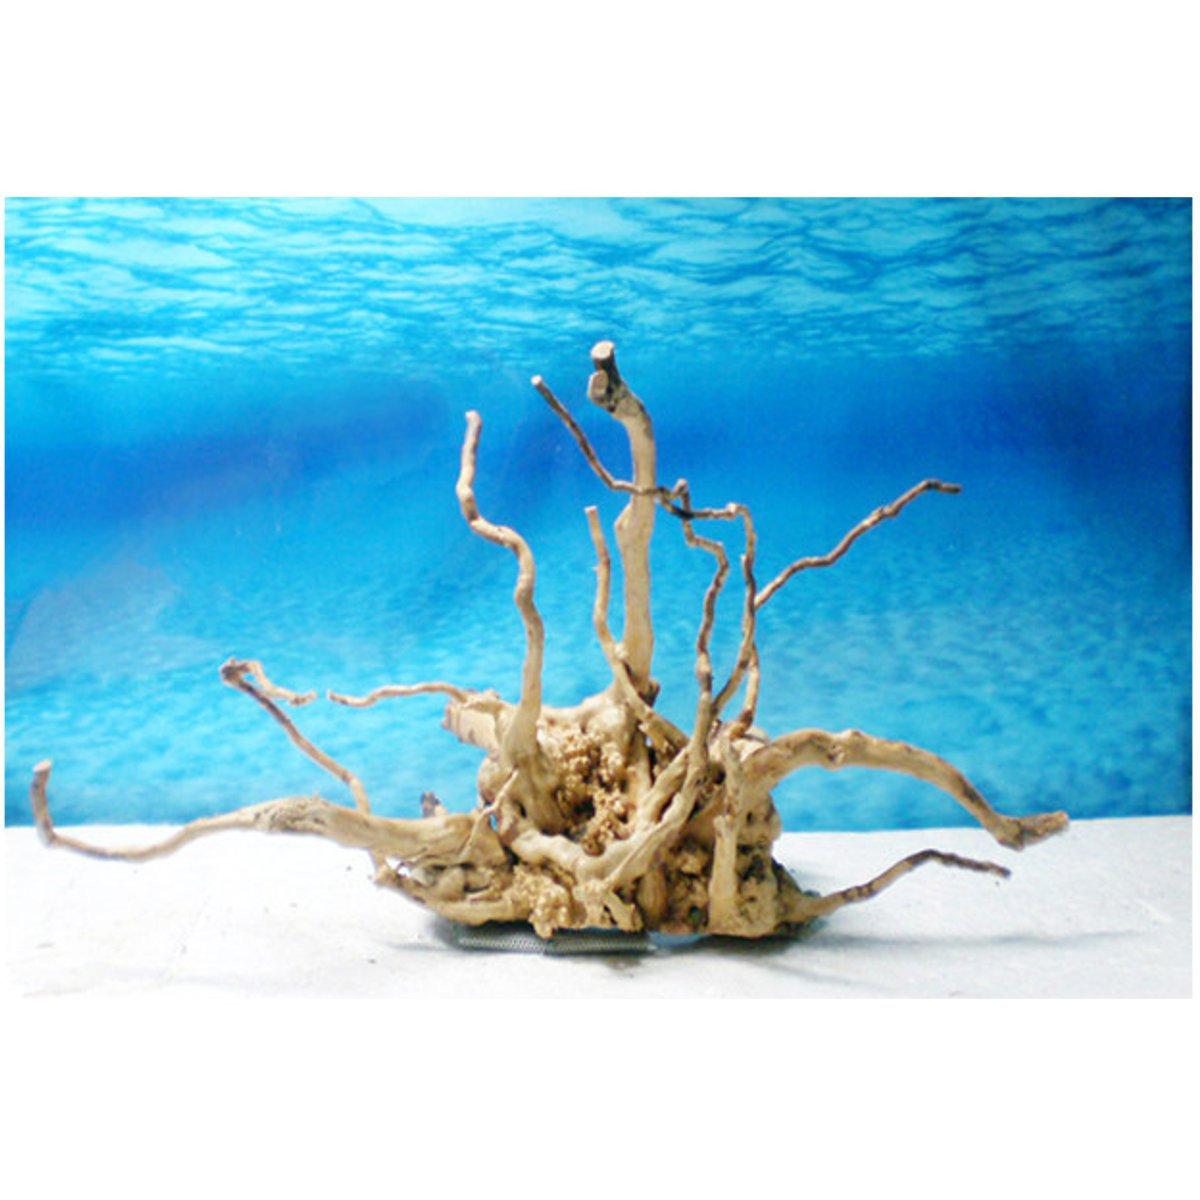 Driftwood Root Natural Aquarium Decoration Tree Trunk Fish Log Stump Cuckoo